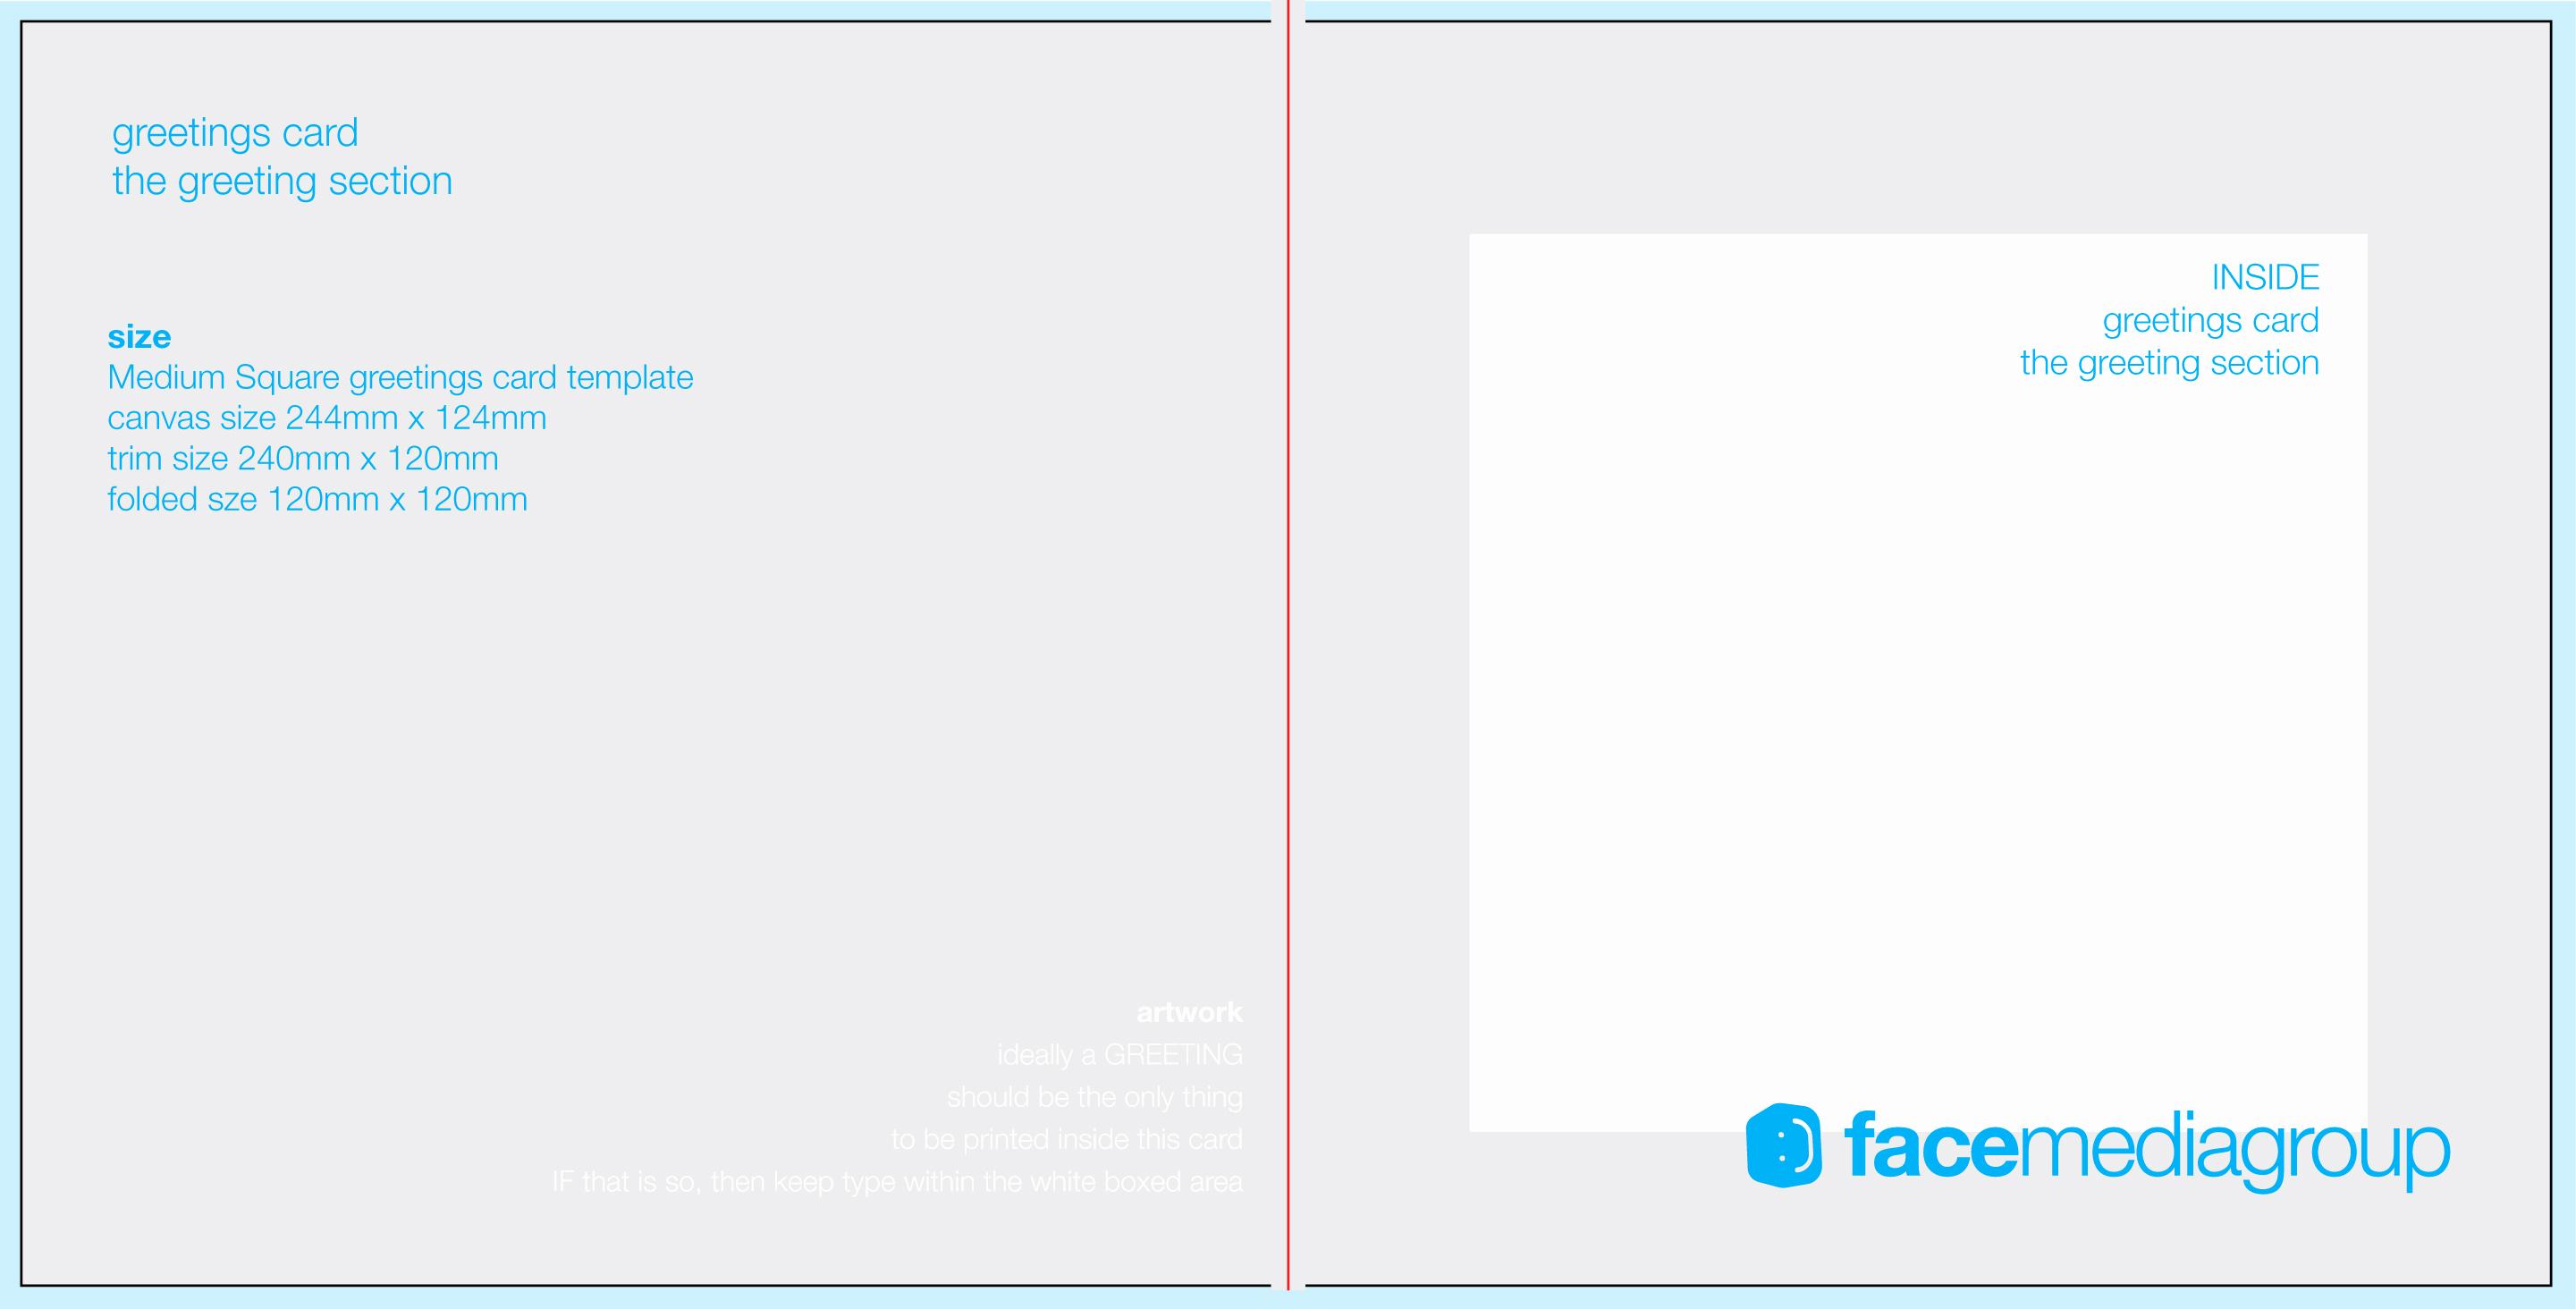 Free Greeting Card Templates Elegant Free Blank Greetings Card Artwork Templates for Download